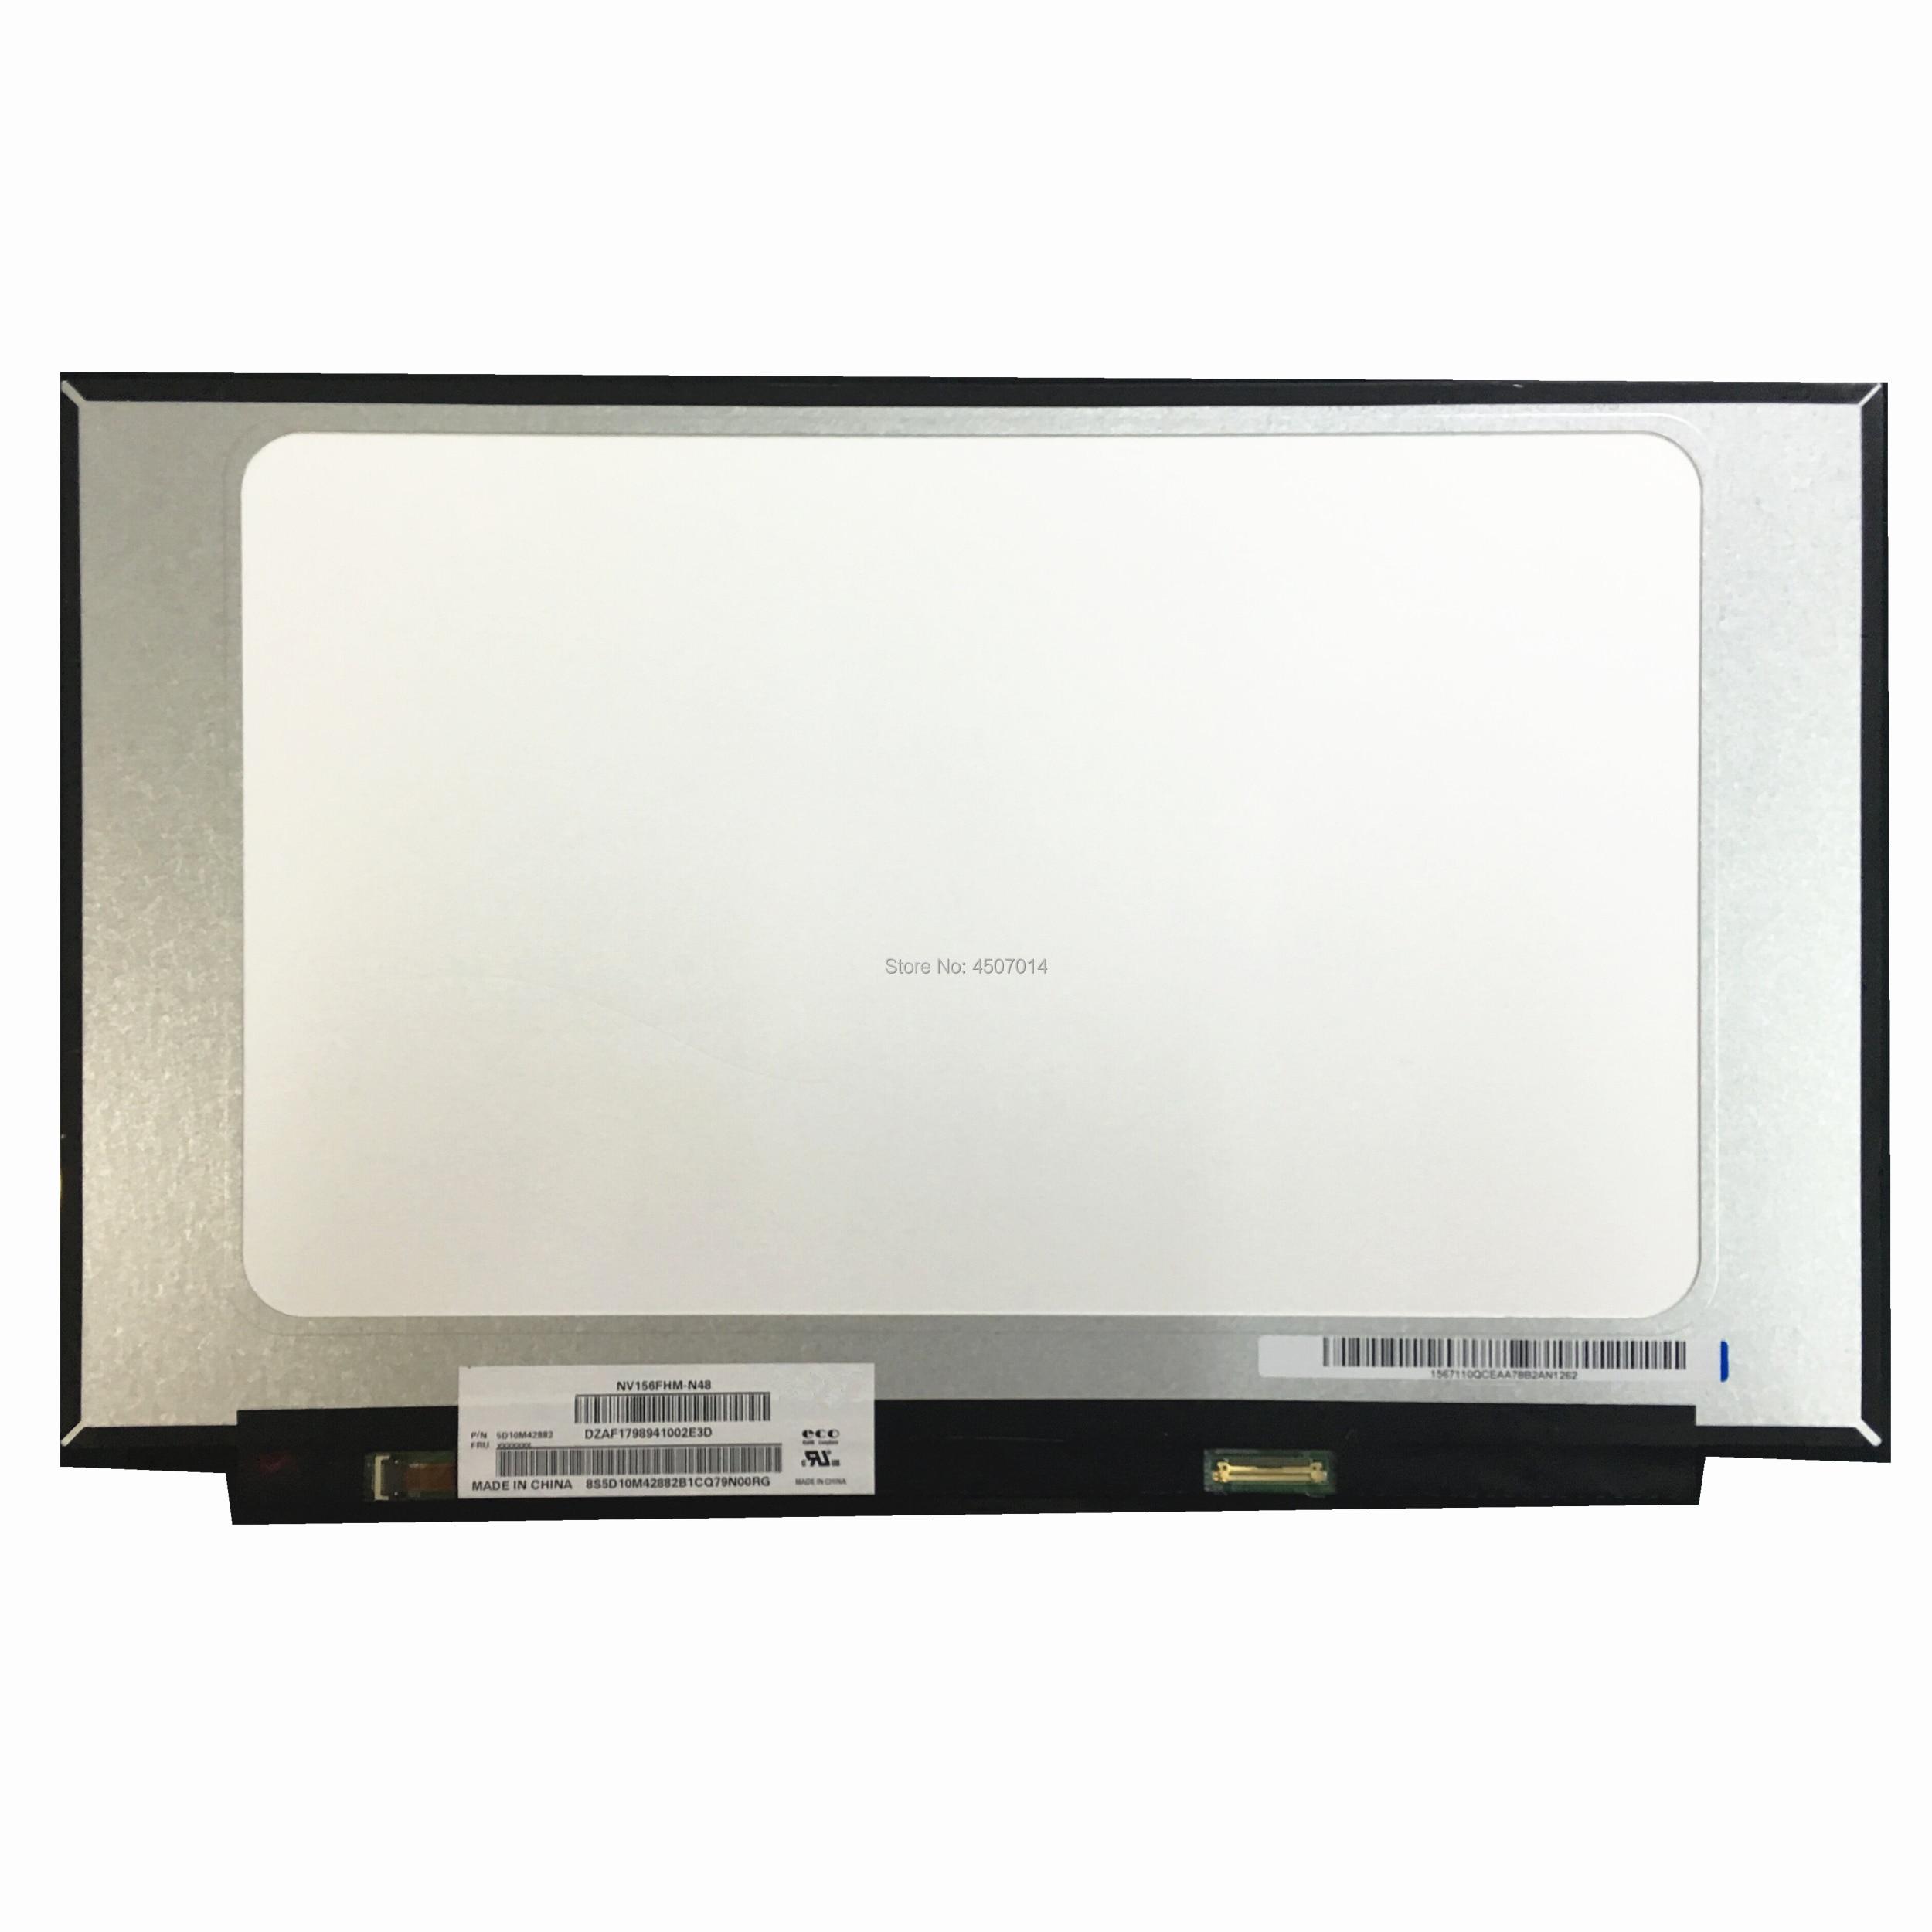 Free Shipping NV156FHM-N48 NV156FHM N48 15.6Laptop Lcd Screen 1920*1080 EDP 30 Pins IPS Lcd Screen Display ReplacementFree Shipping NV156FHM-N48 NV156FHM N48 15.6Laptop Lcd Screen 1920*1080 EDP 30 Pins IPS Lcd Screen Display Replacement